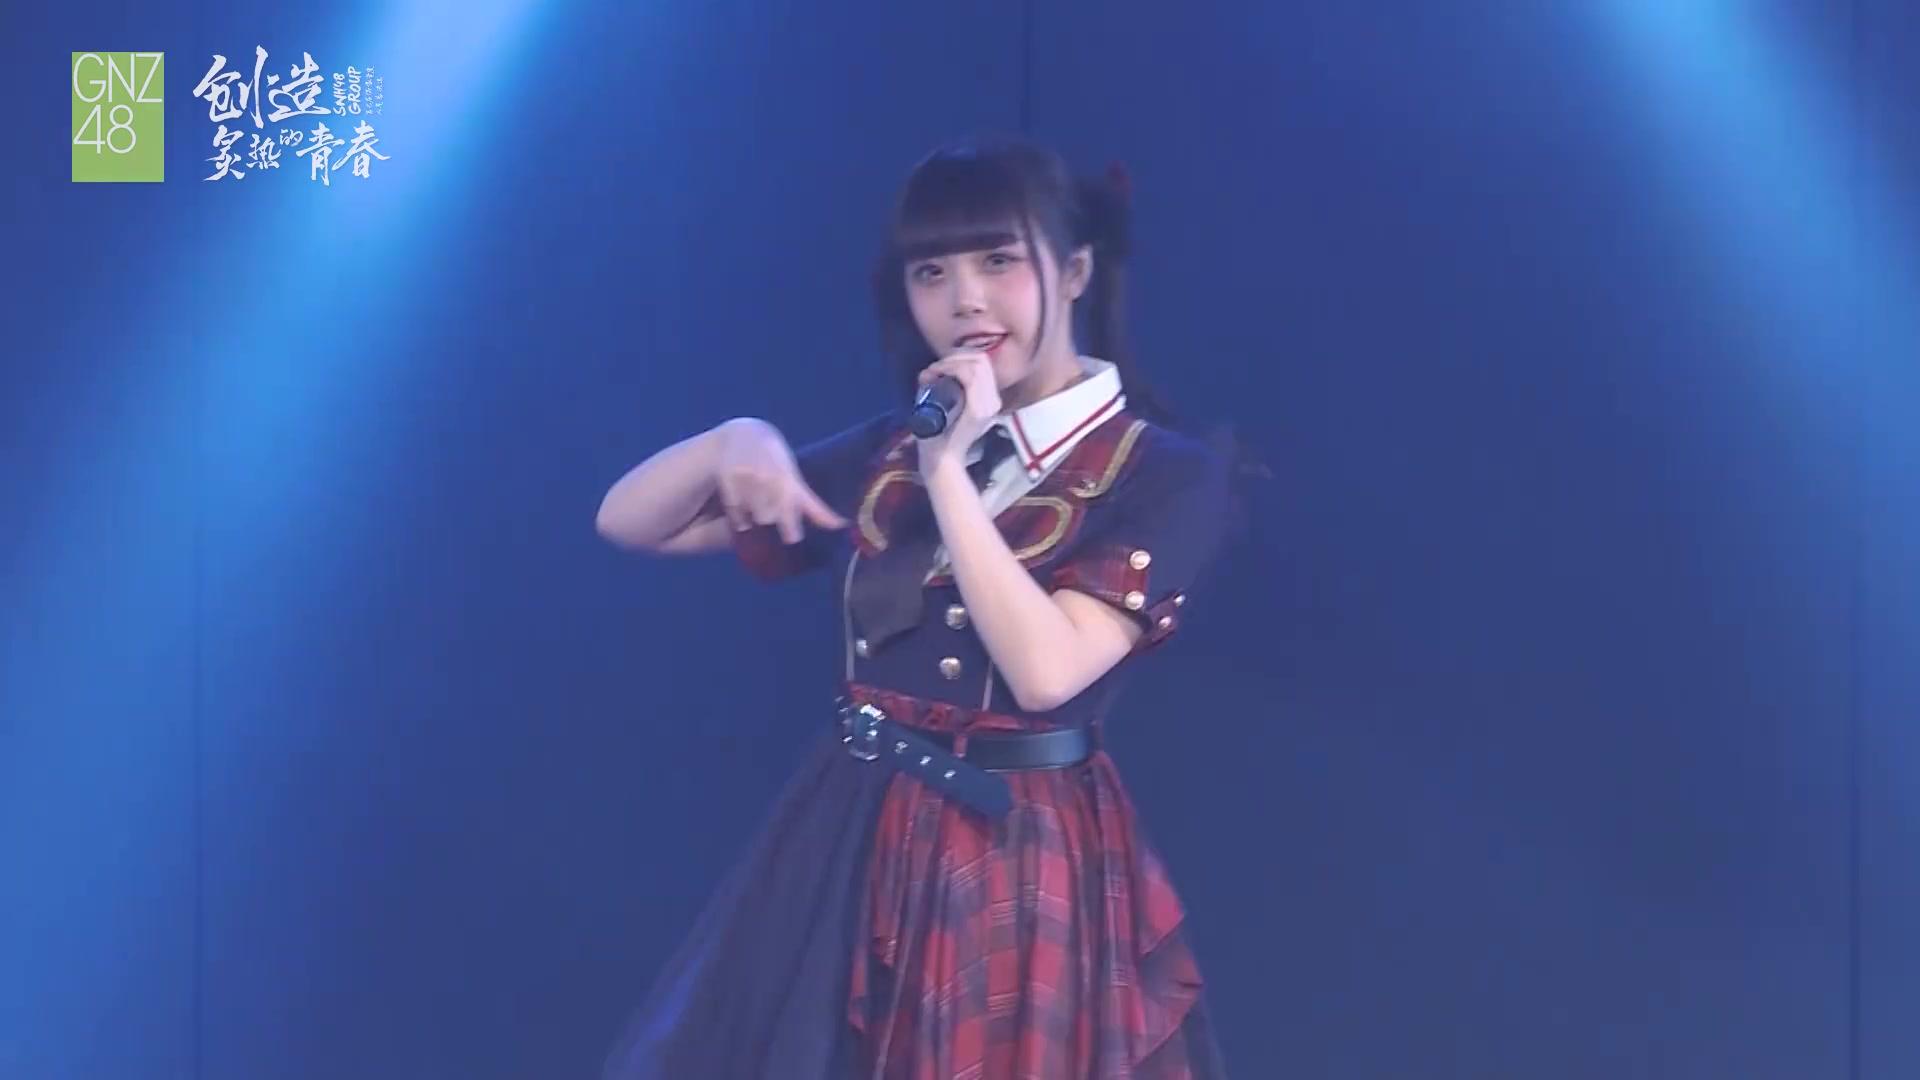 【GNZ48】【罗可嘉】夏至系列活动奖励《剧场女神》PV 《剧场女神》